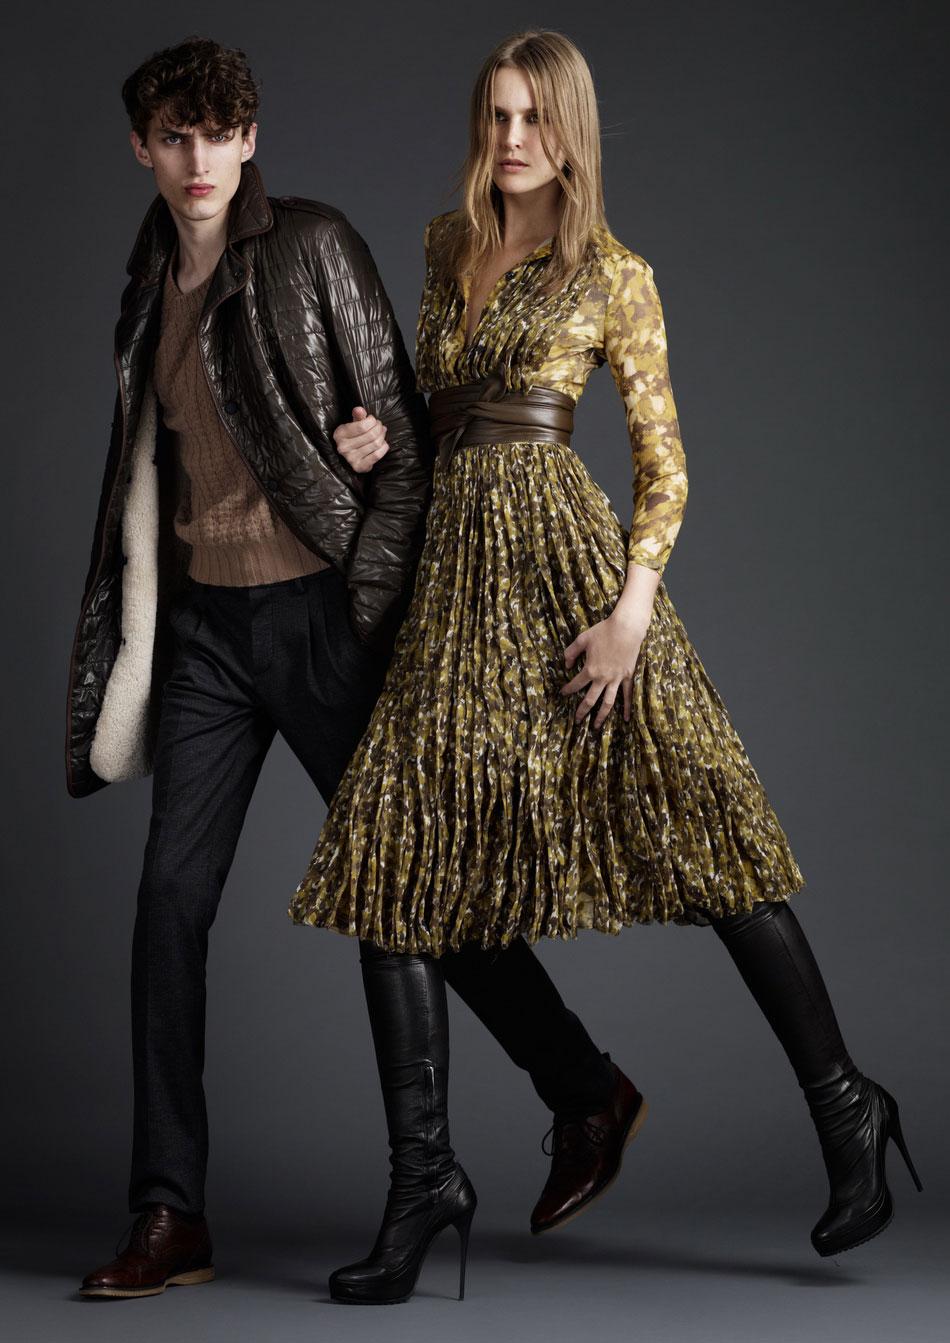 burberry prorsum menswear pre collection autumn winter 2011. Black Bedroom Furniture Sets. Home Design Ideas